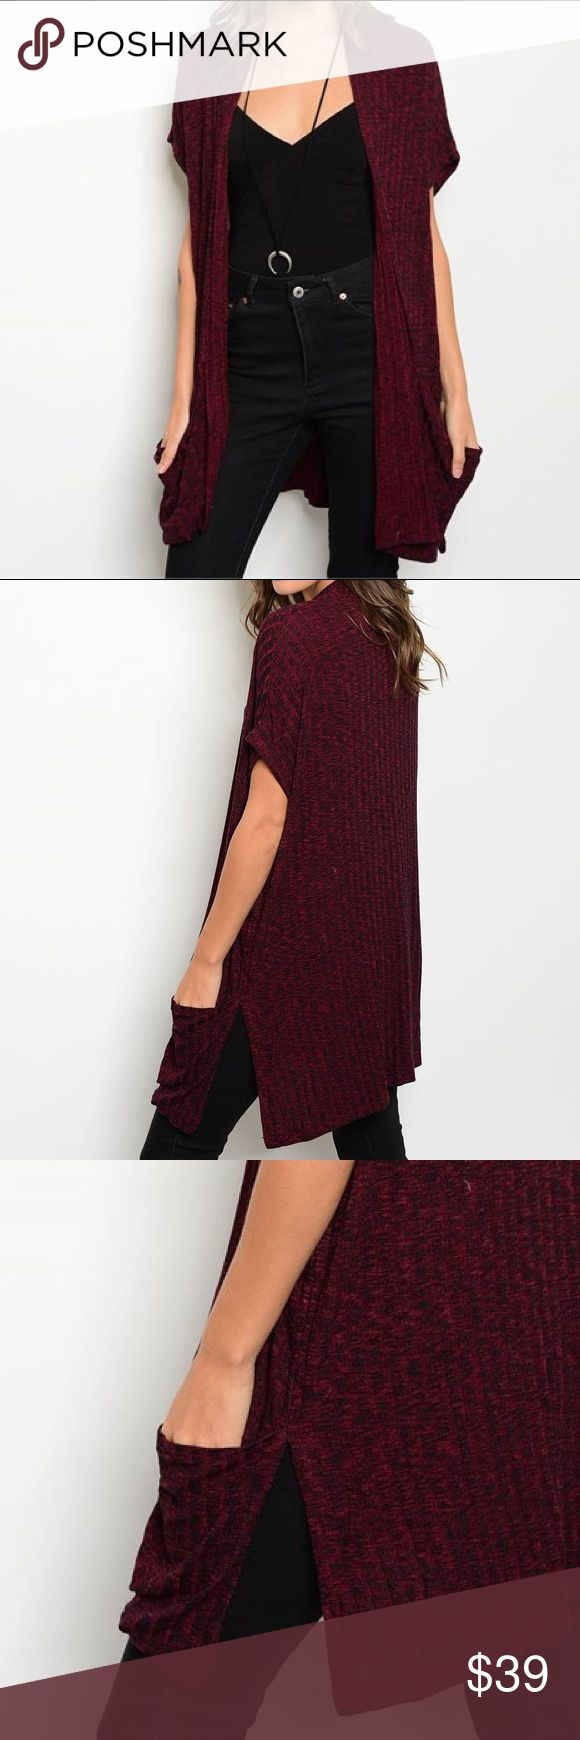 ✨NEW✨Wine Split Pocket Long Cardigan Long sleeve round neck striped slub knit top with lace trim. Spandex blend. Sweaters Cardigans